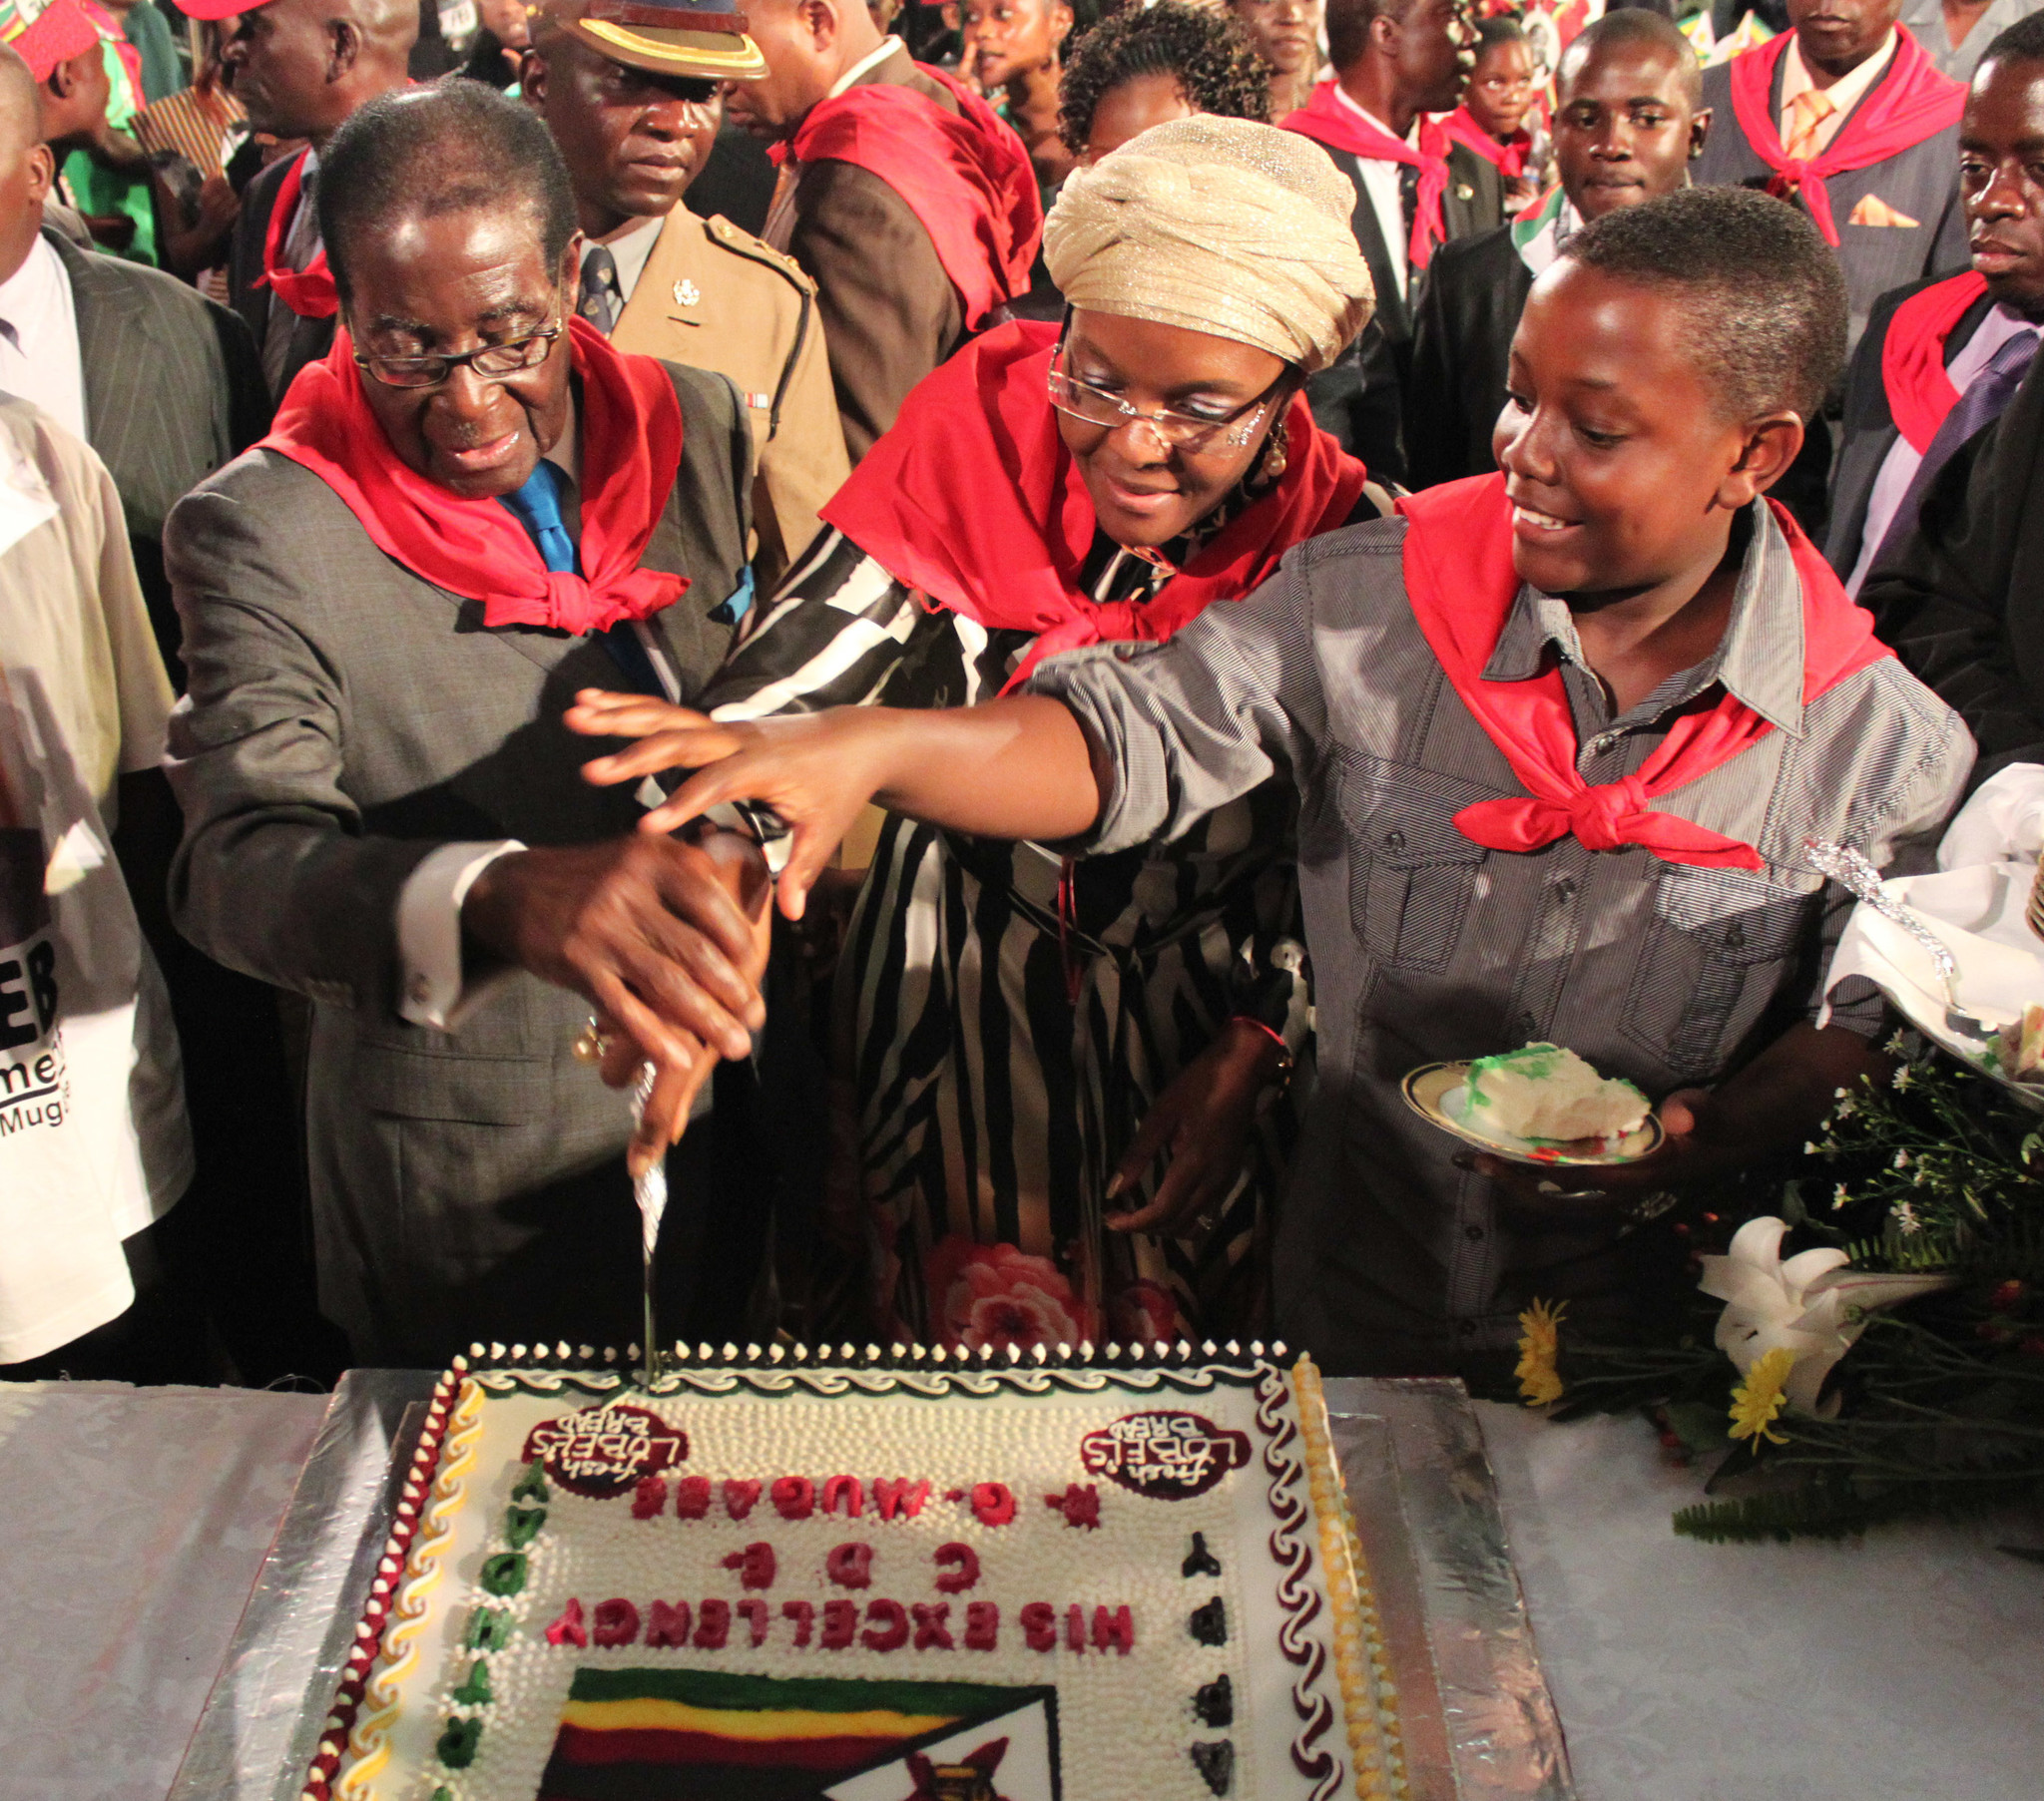 Robert Mugabe Celebrates 87th Birthday In Harare